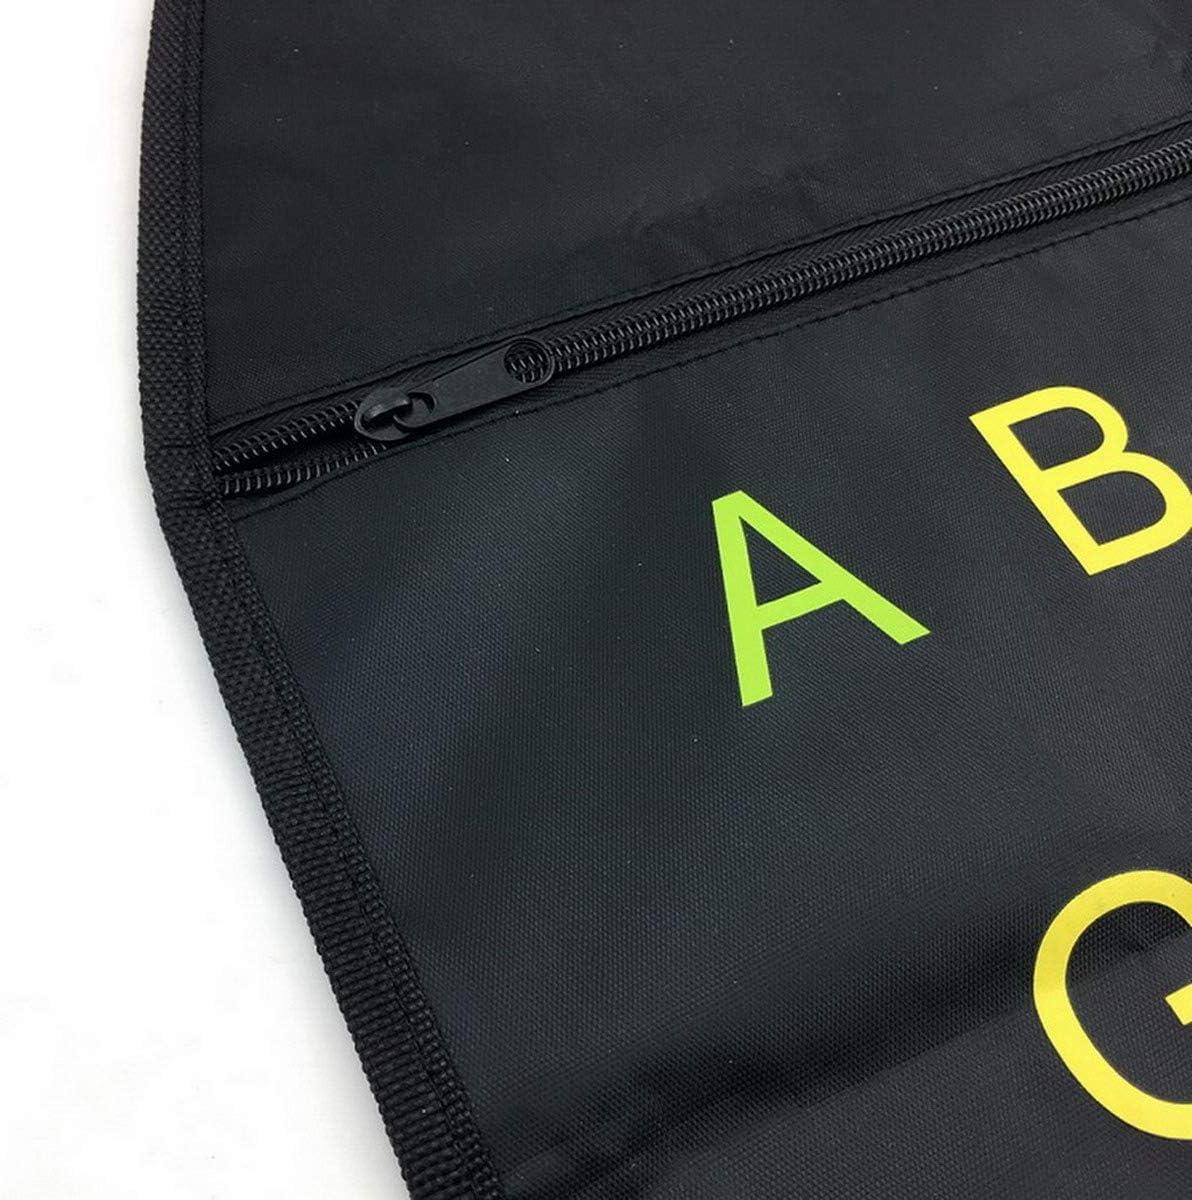 AOOPOO Car Seat Back Protector Multi-Function Car Seat Organiser Kick Mats Zipper Universal Backseat Hanging Bag Colorful English Alphabet